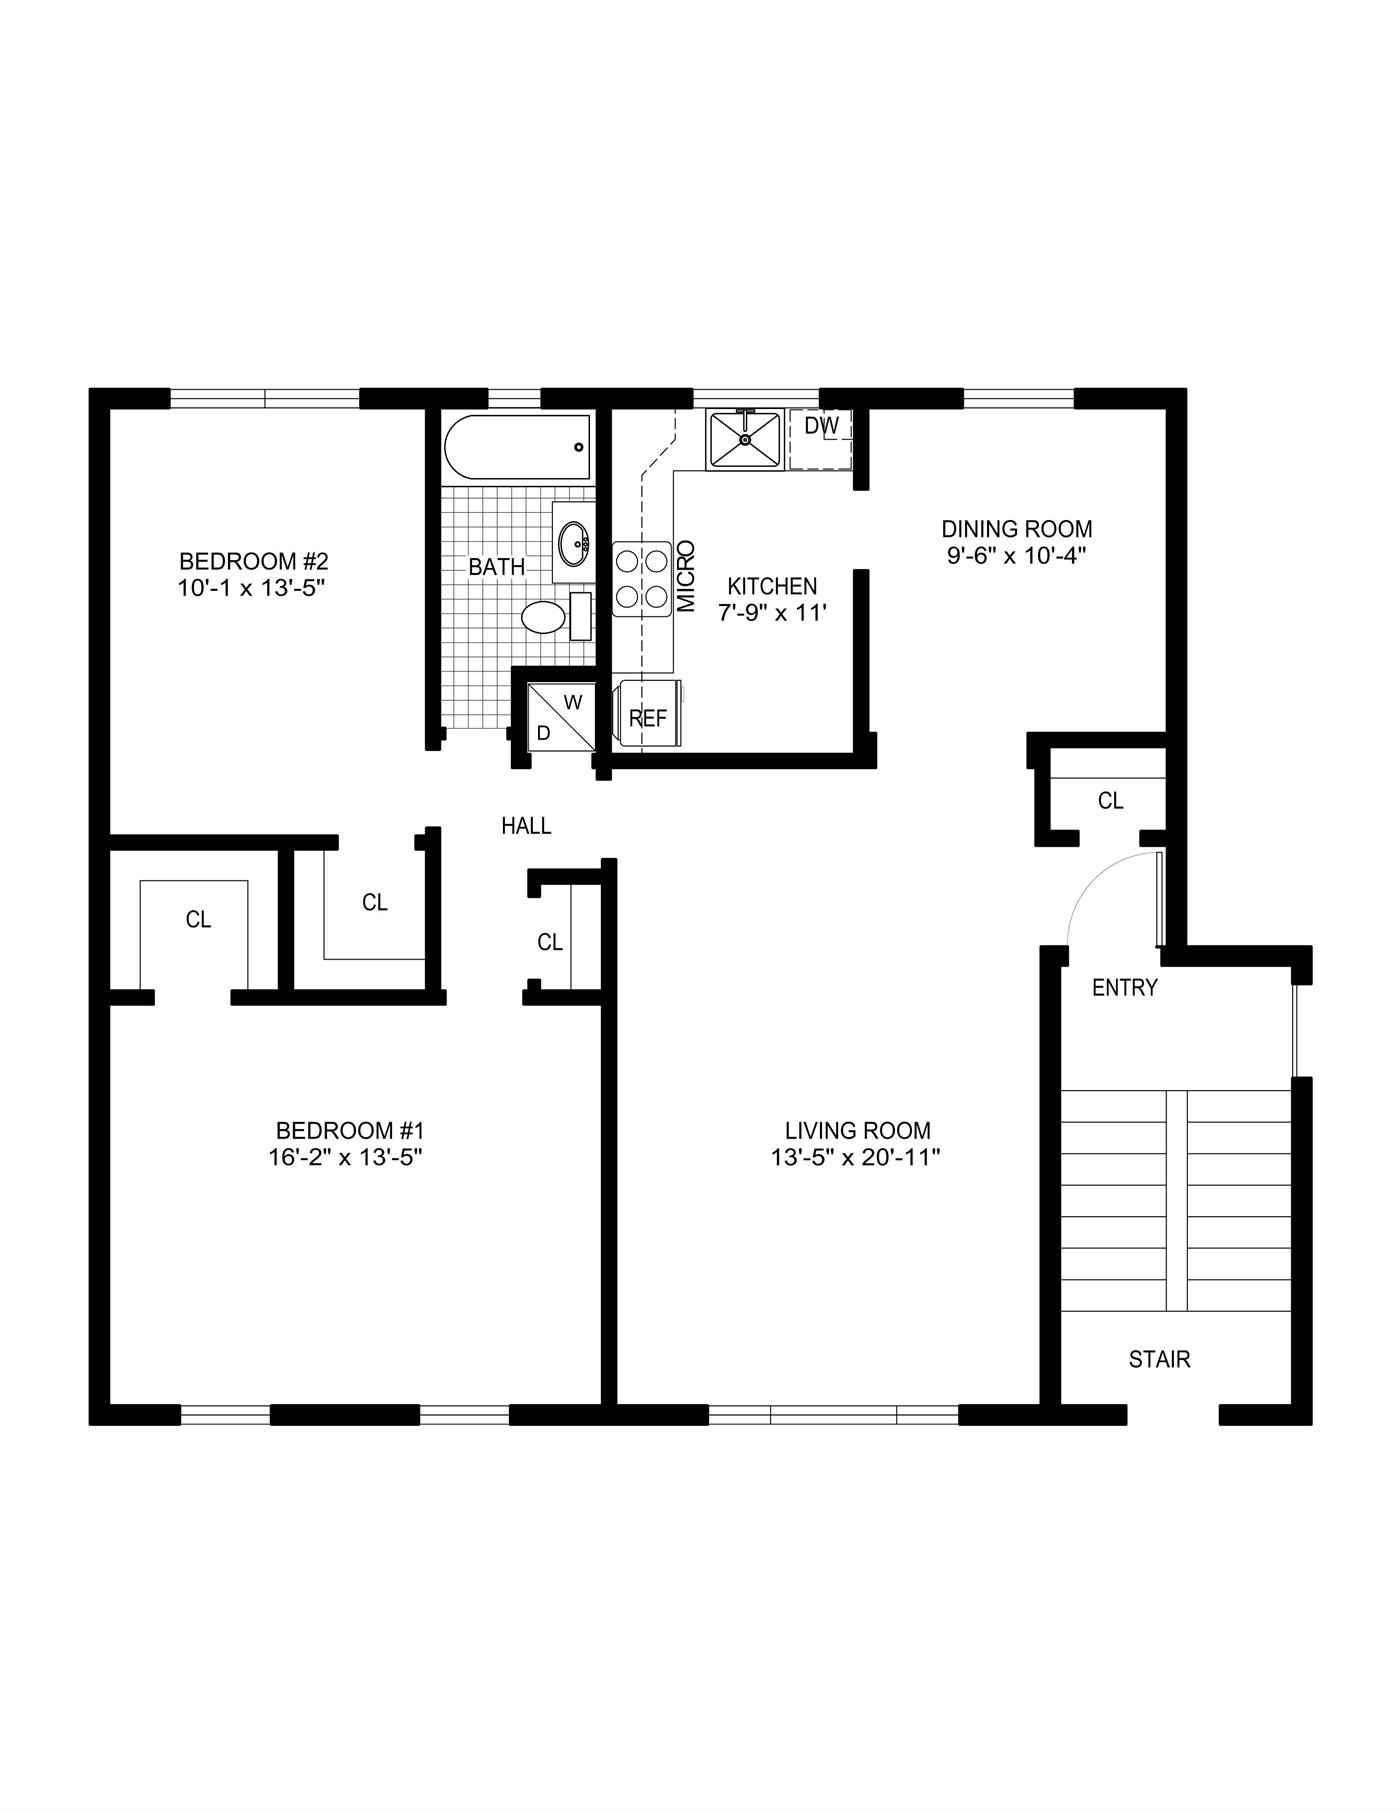 Building Drawing Plan | Free download